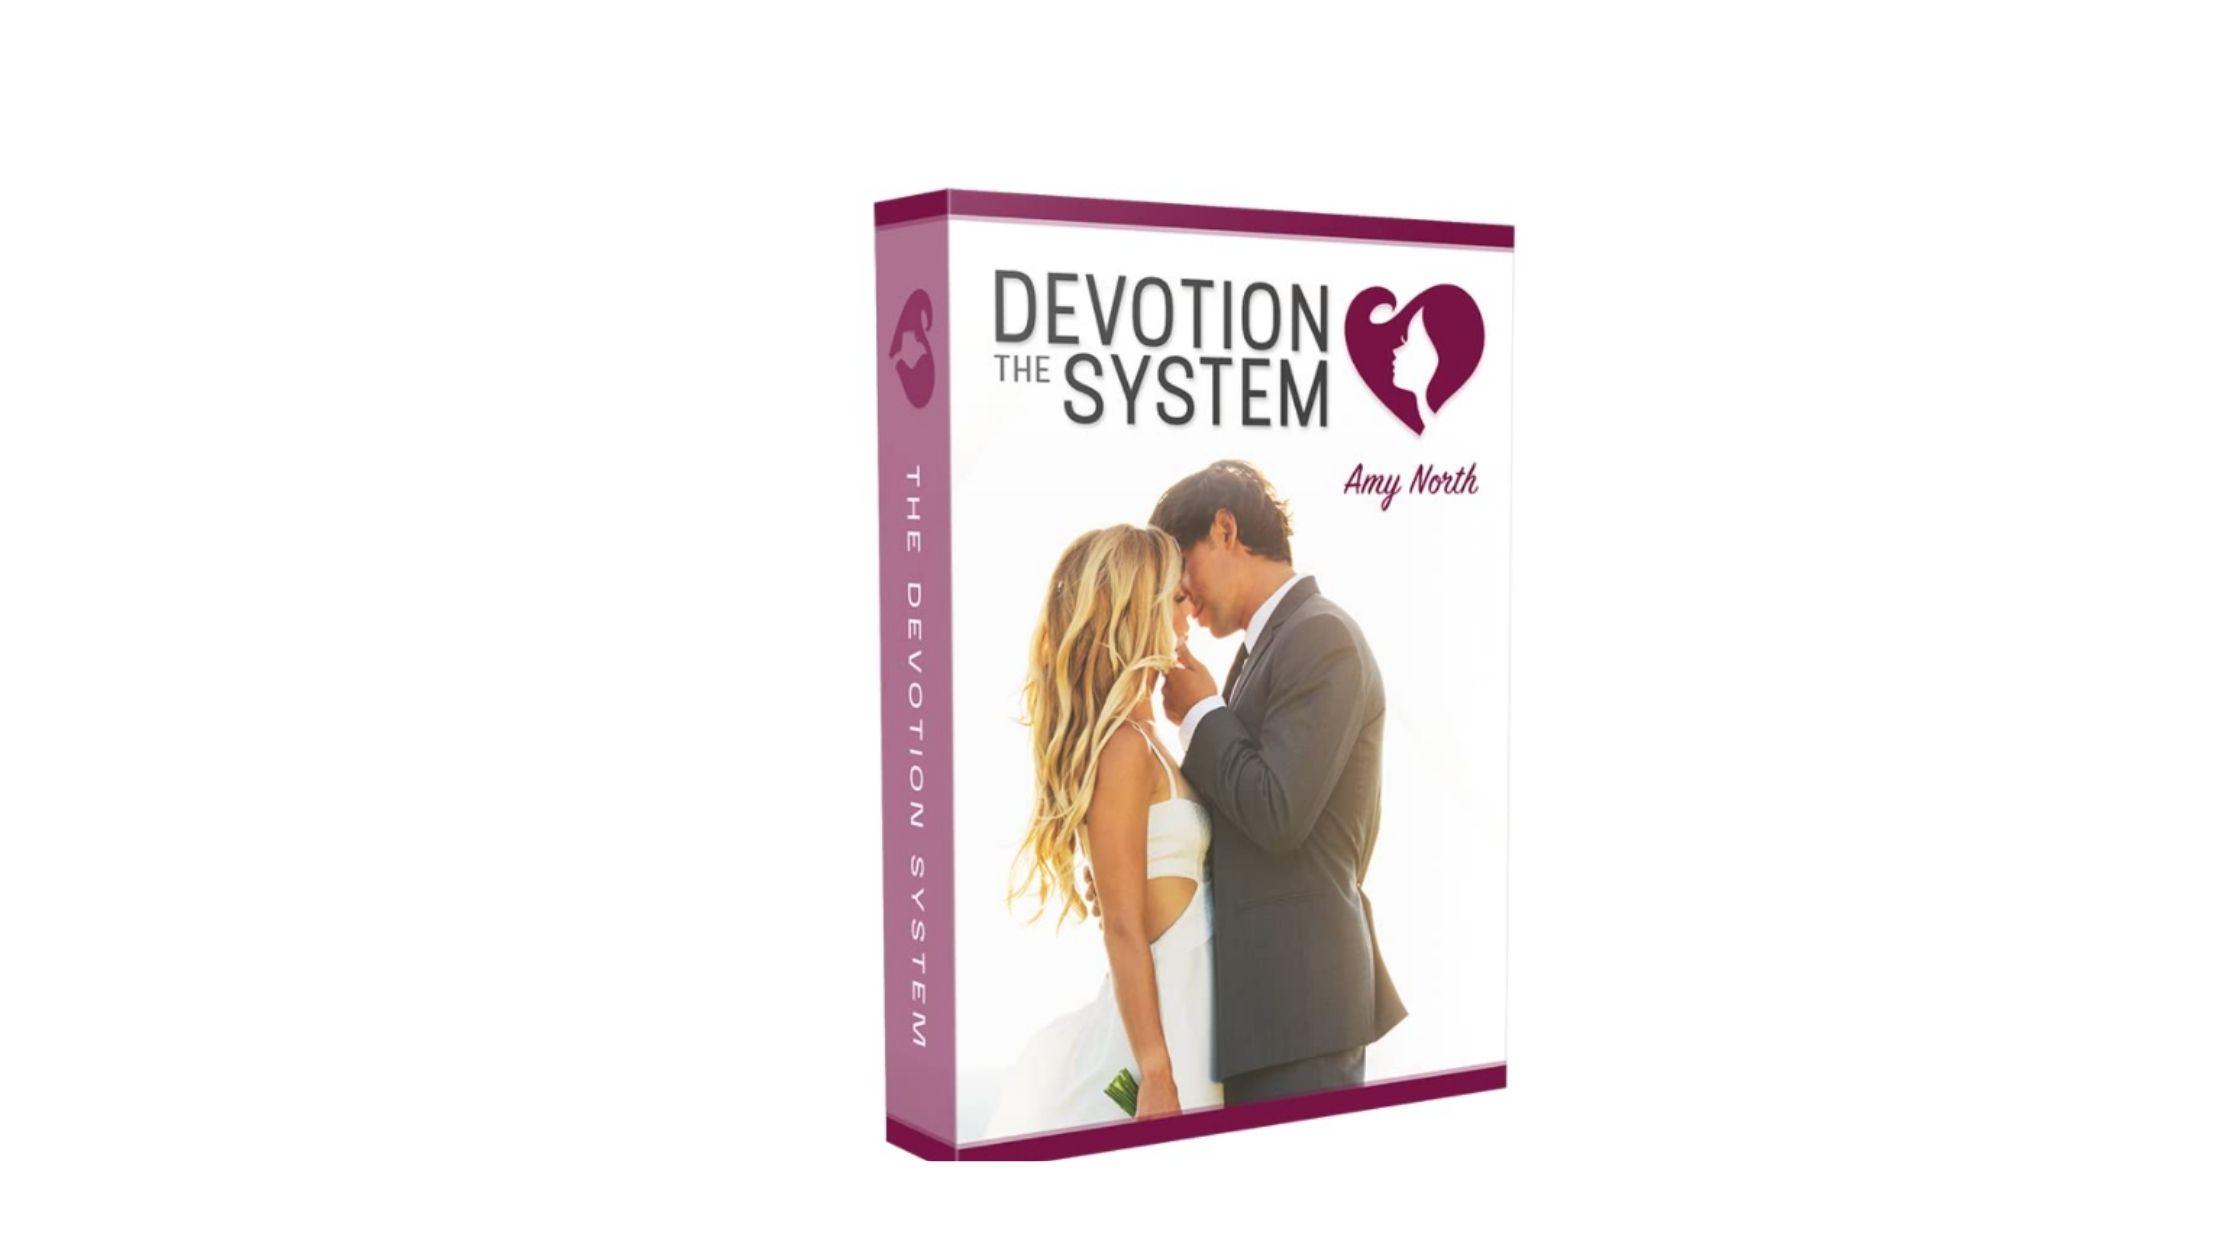 The-Devotion-System-Reviews